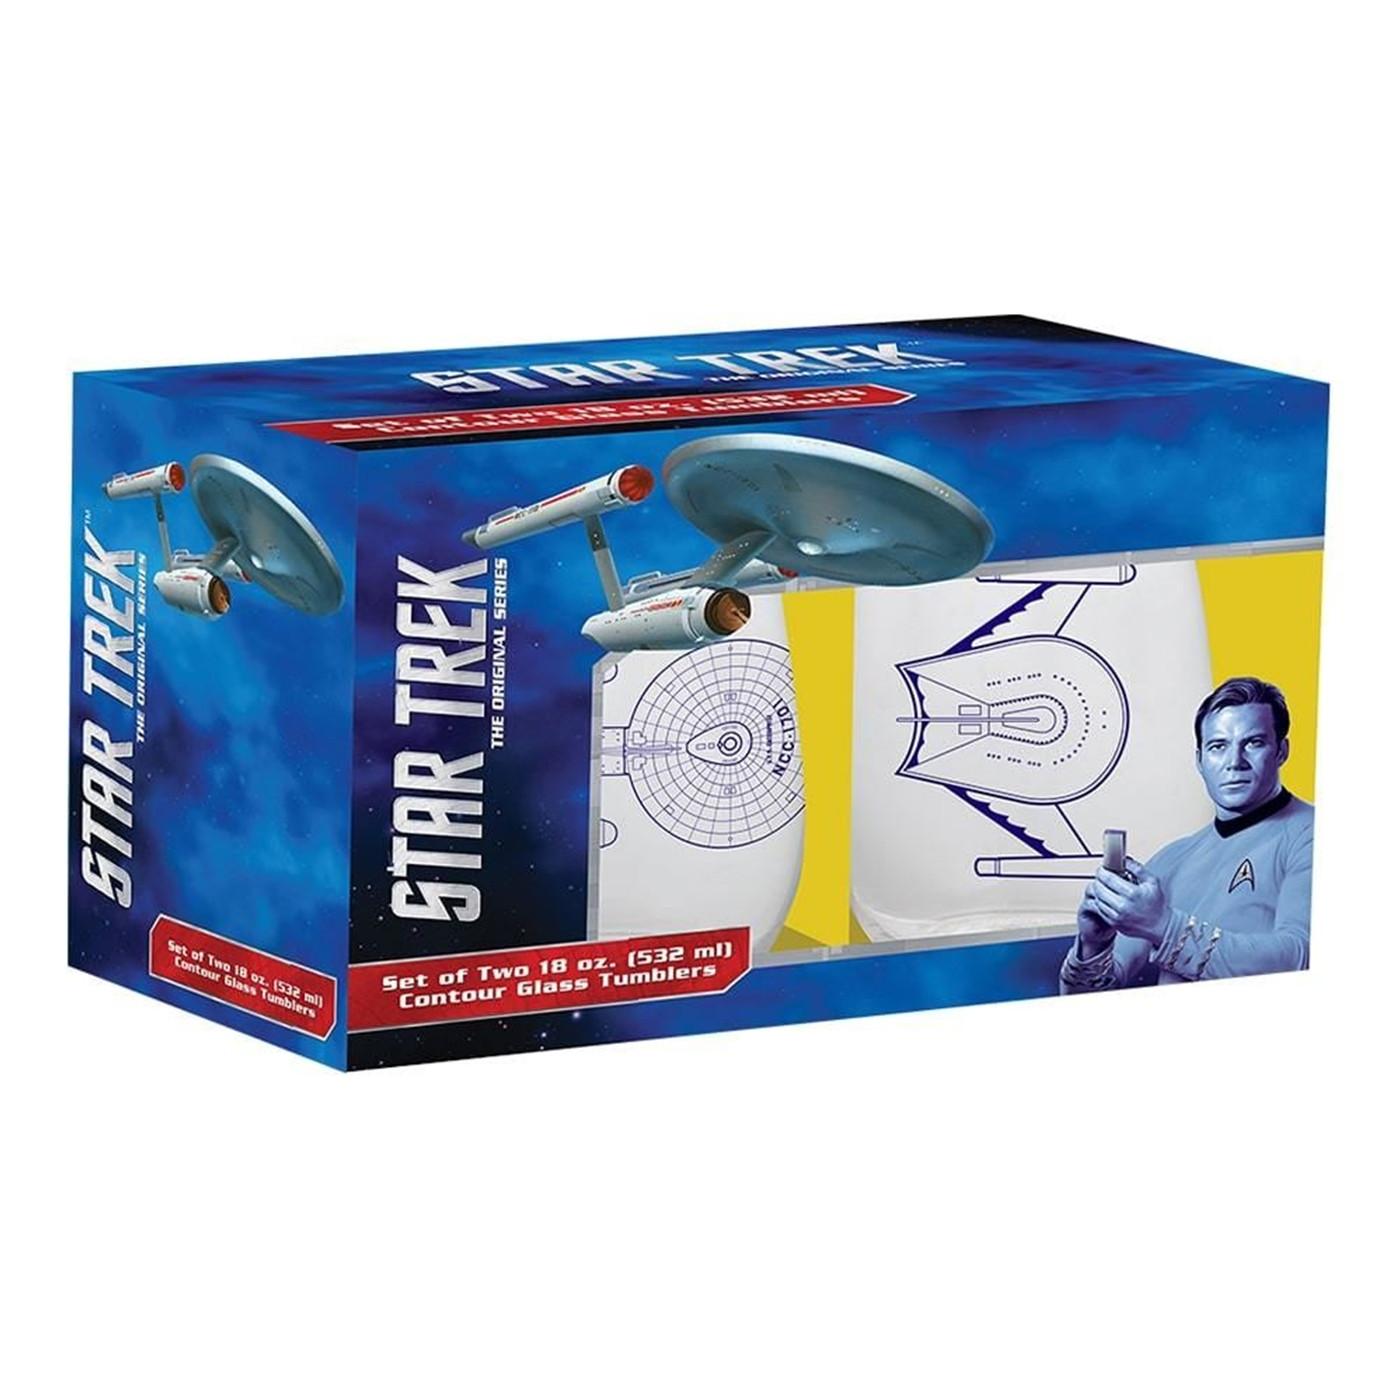 Star Trek 18 oz. Contour Glasses - Set of Two